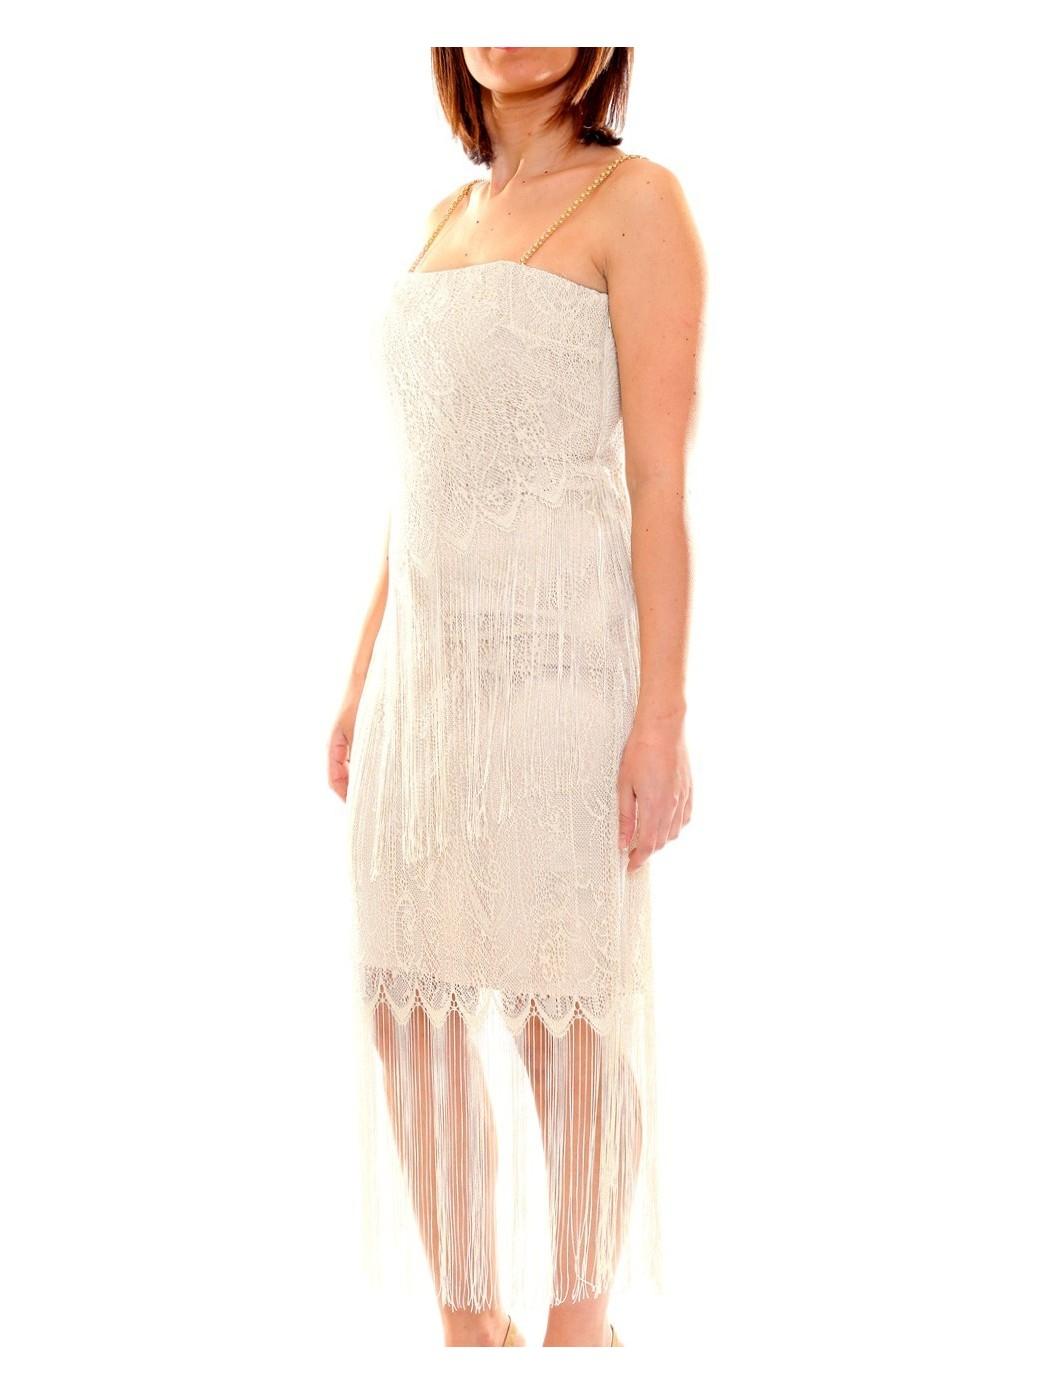 Sonia Peña dress